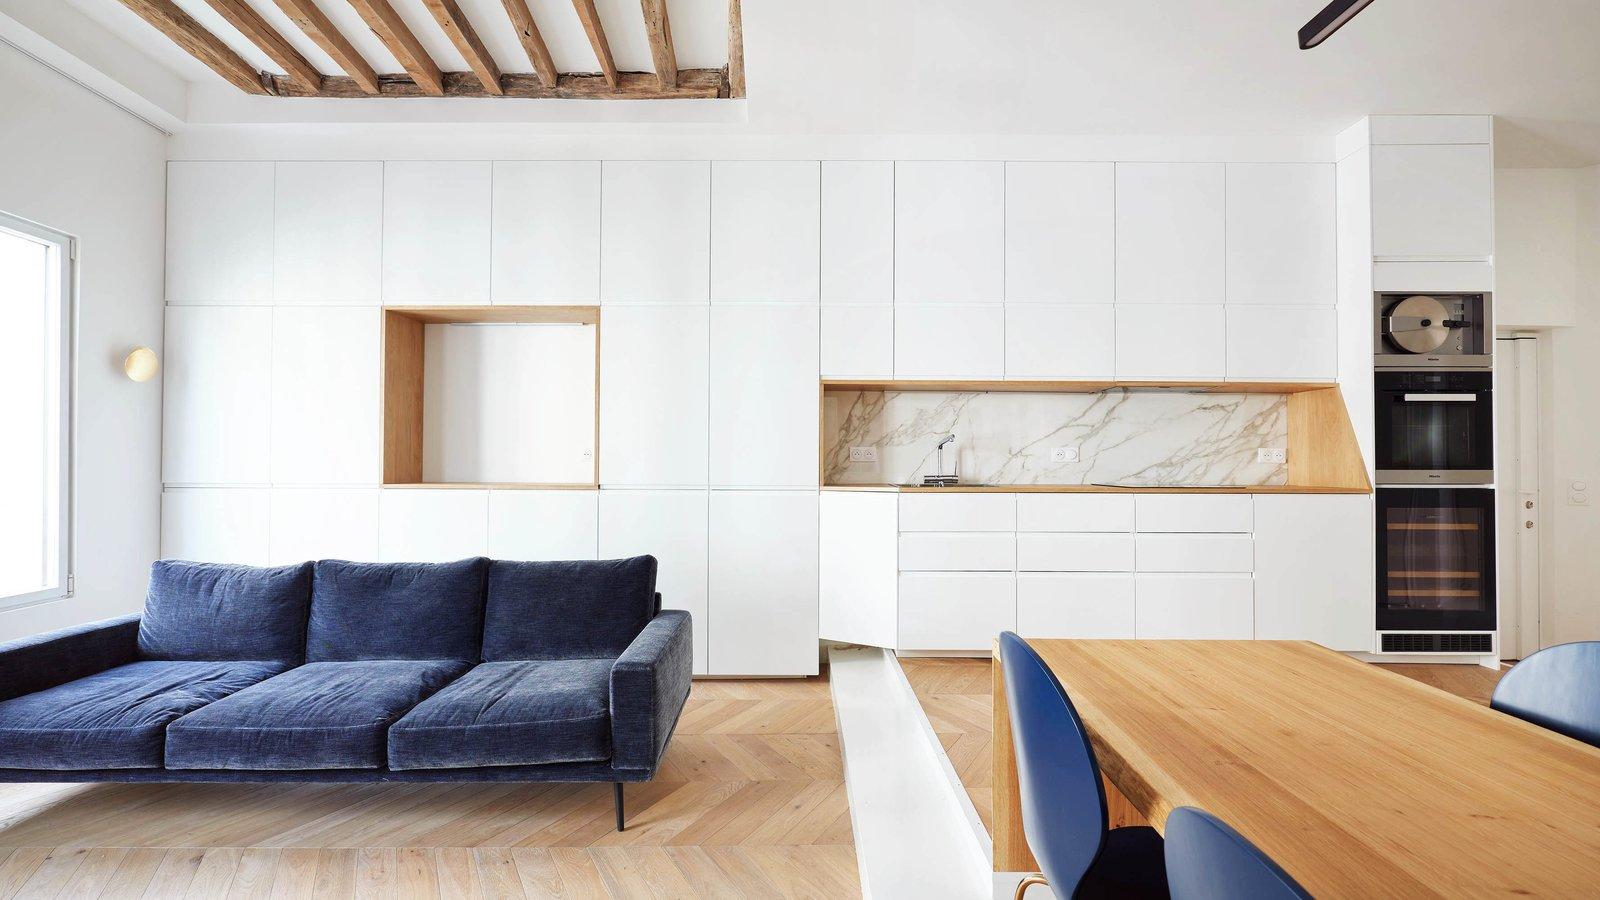 8 Home Renovations Under $300k